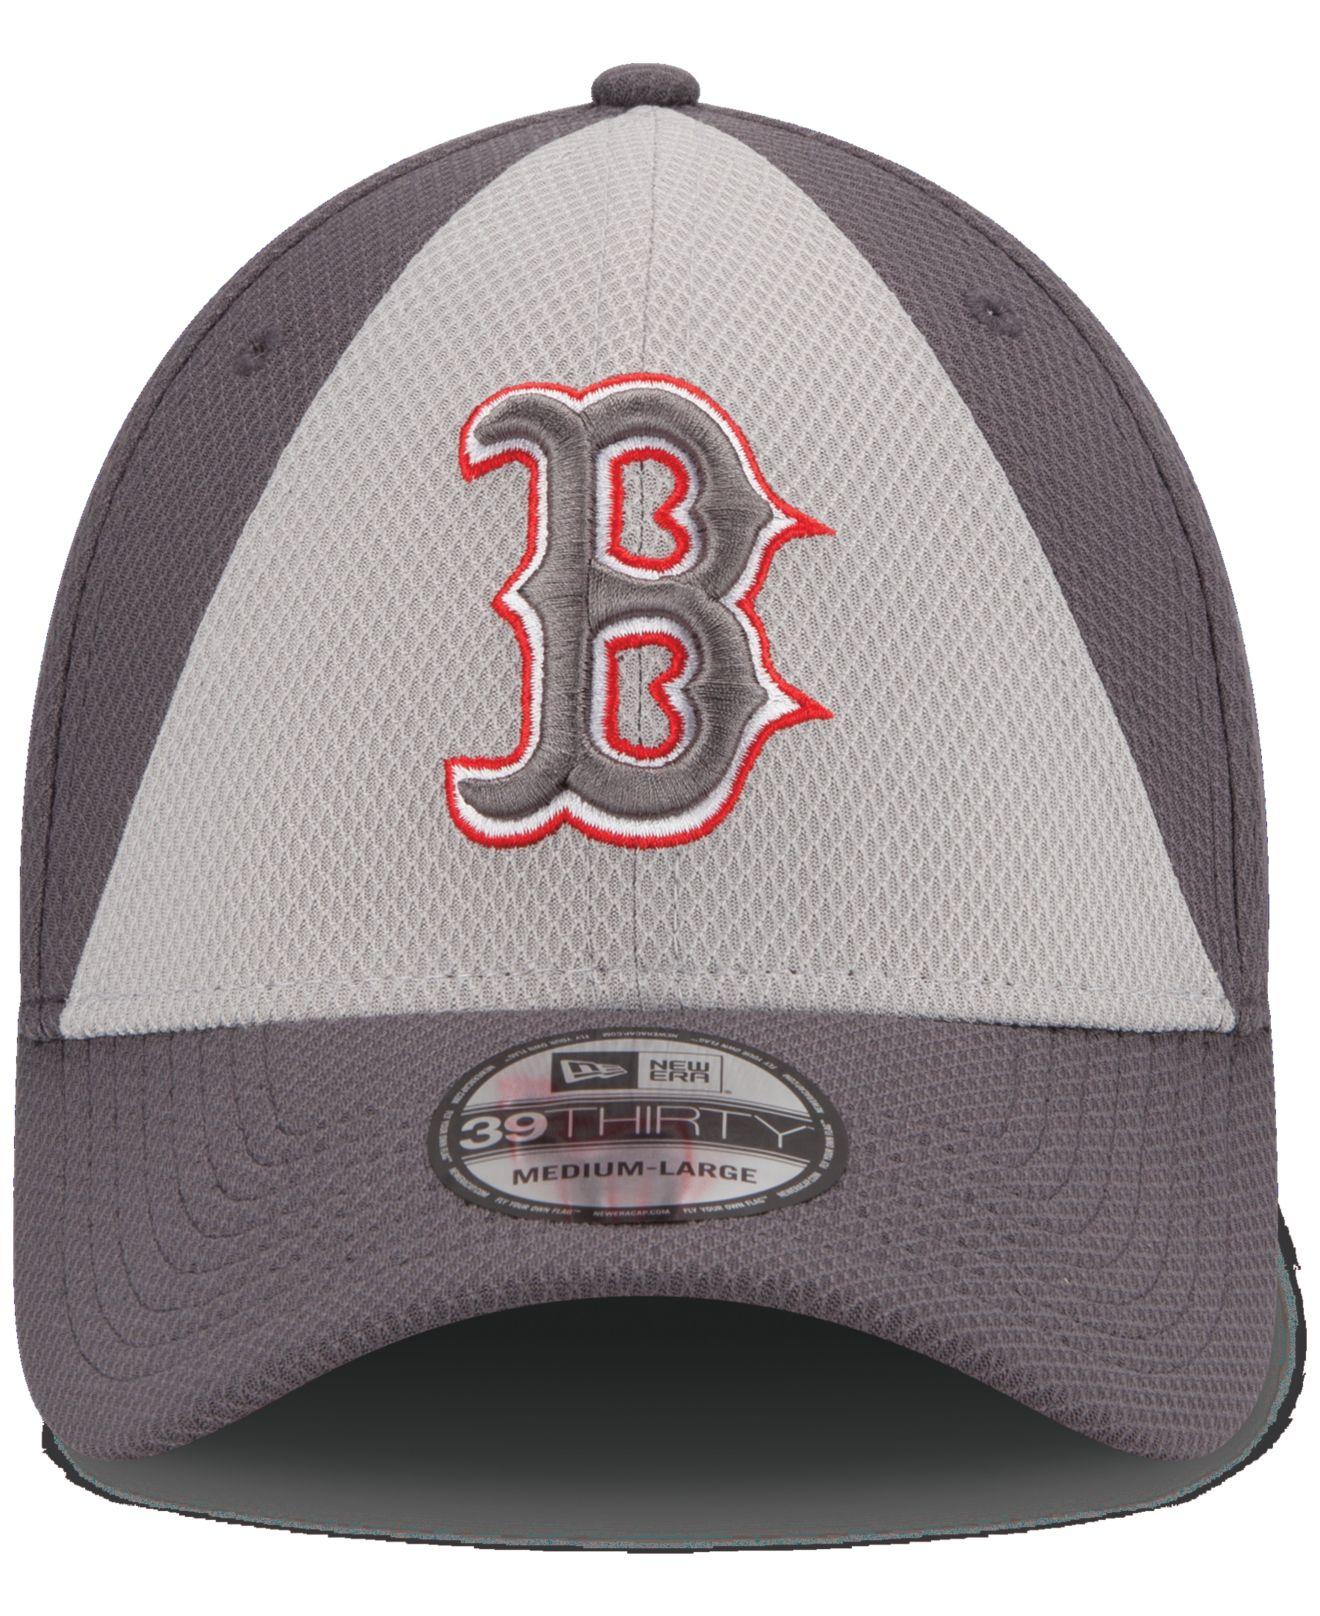 free shipping 175a0 71d14 Lyst - KTZ Boston Red Sox Diamond Era Double Play 39thirty Cap in ...